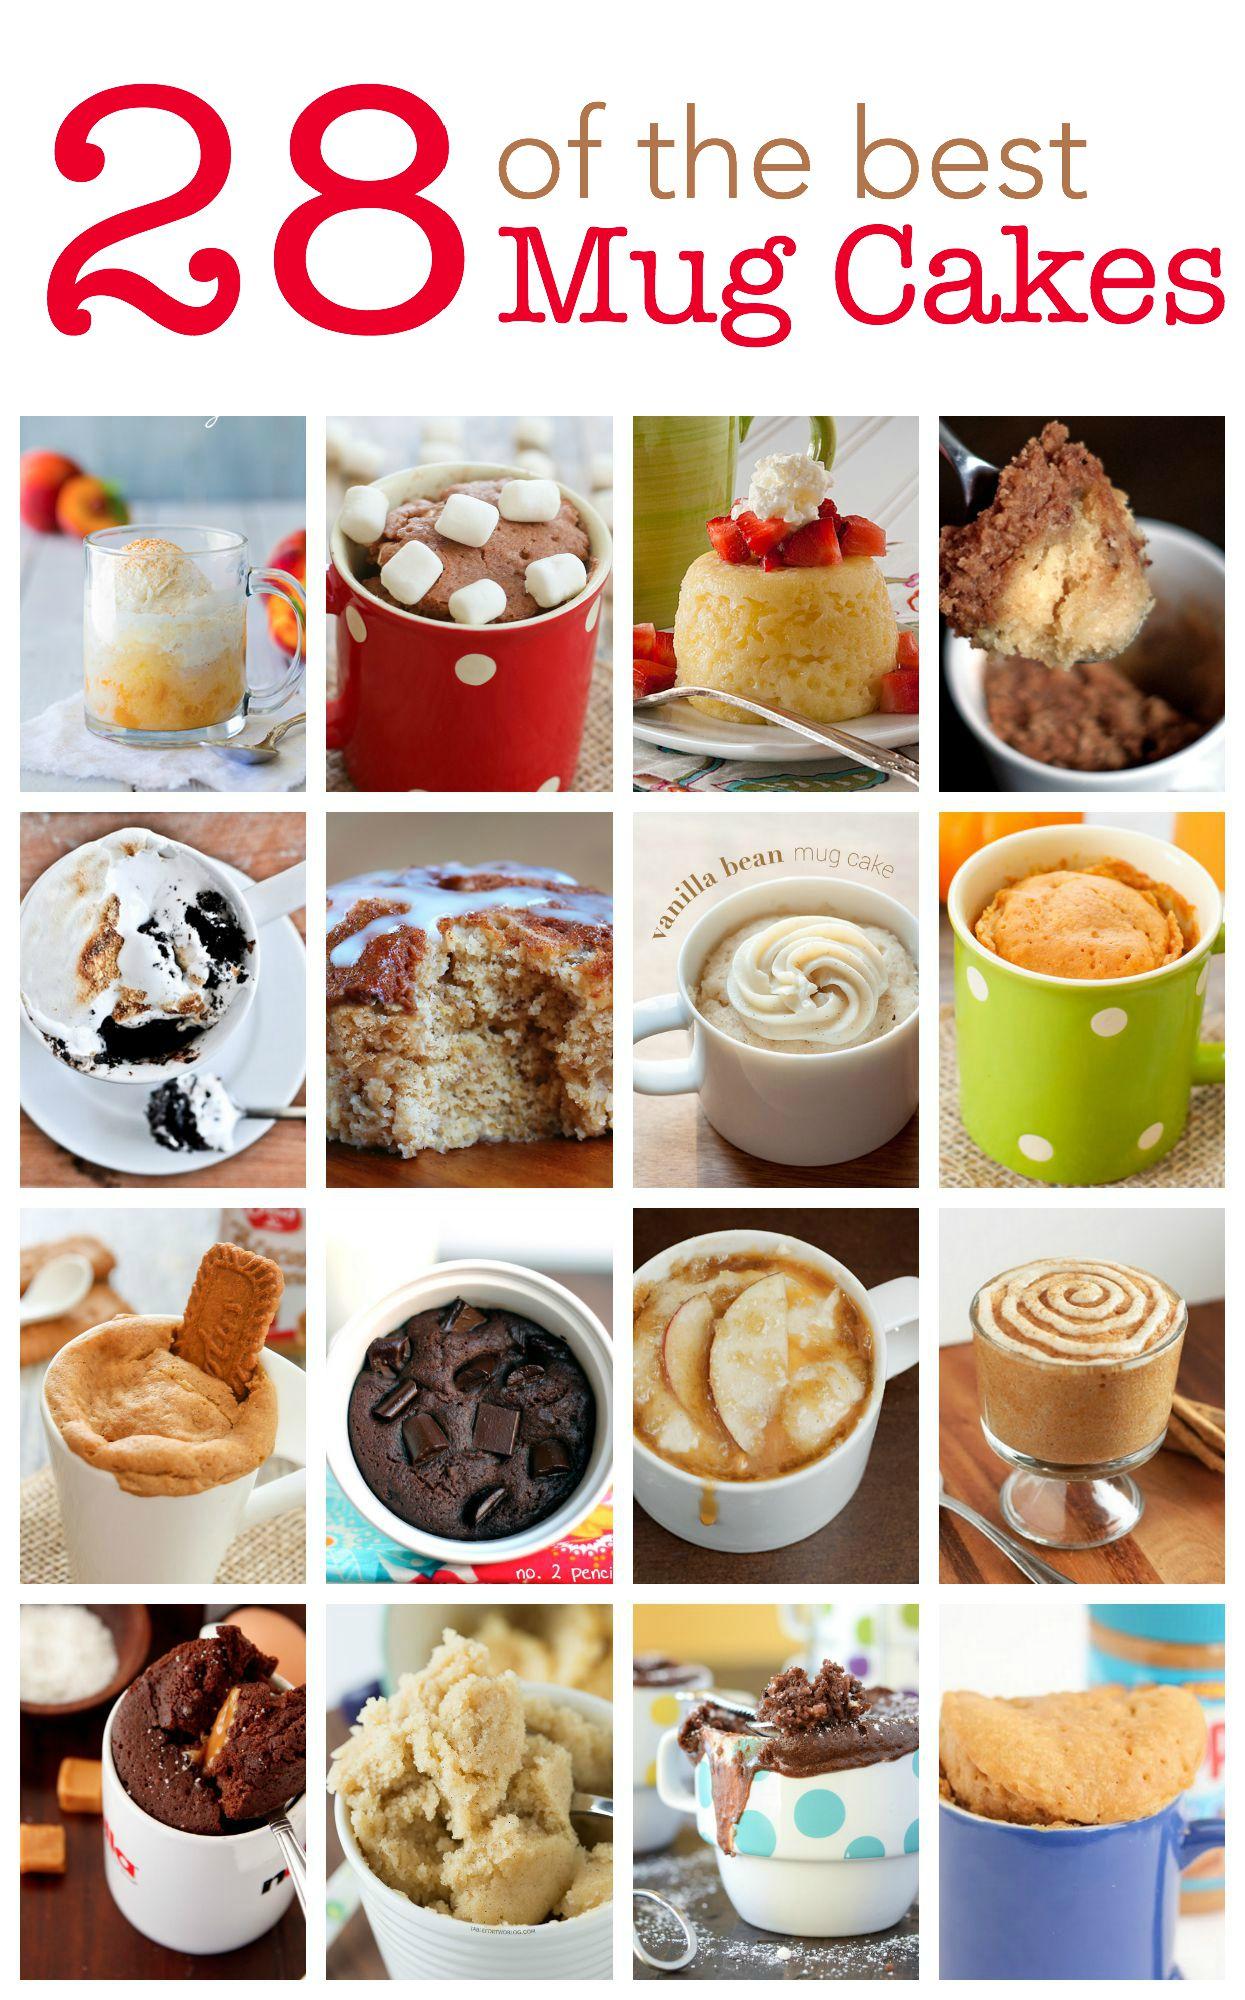 28 of the Best Mug Cakes